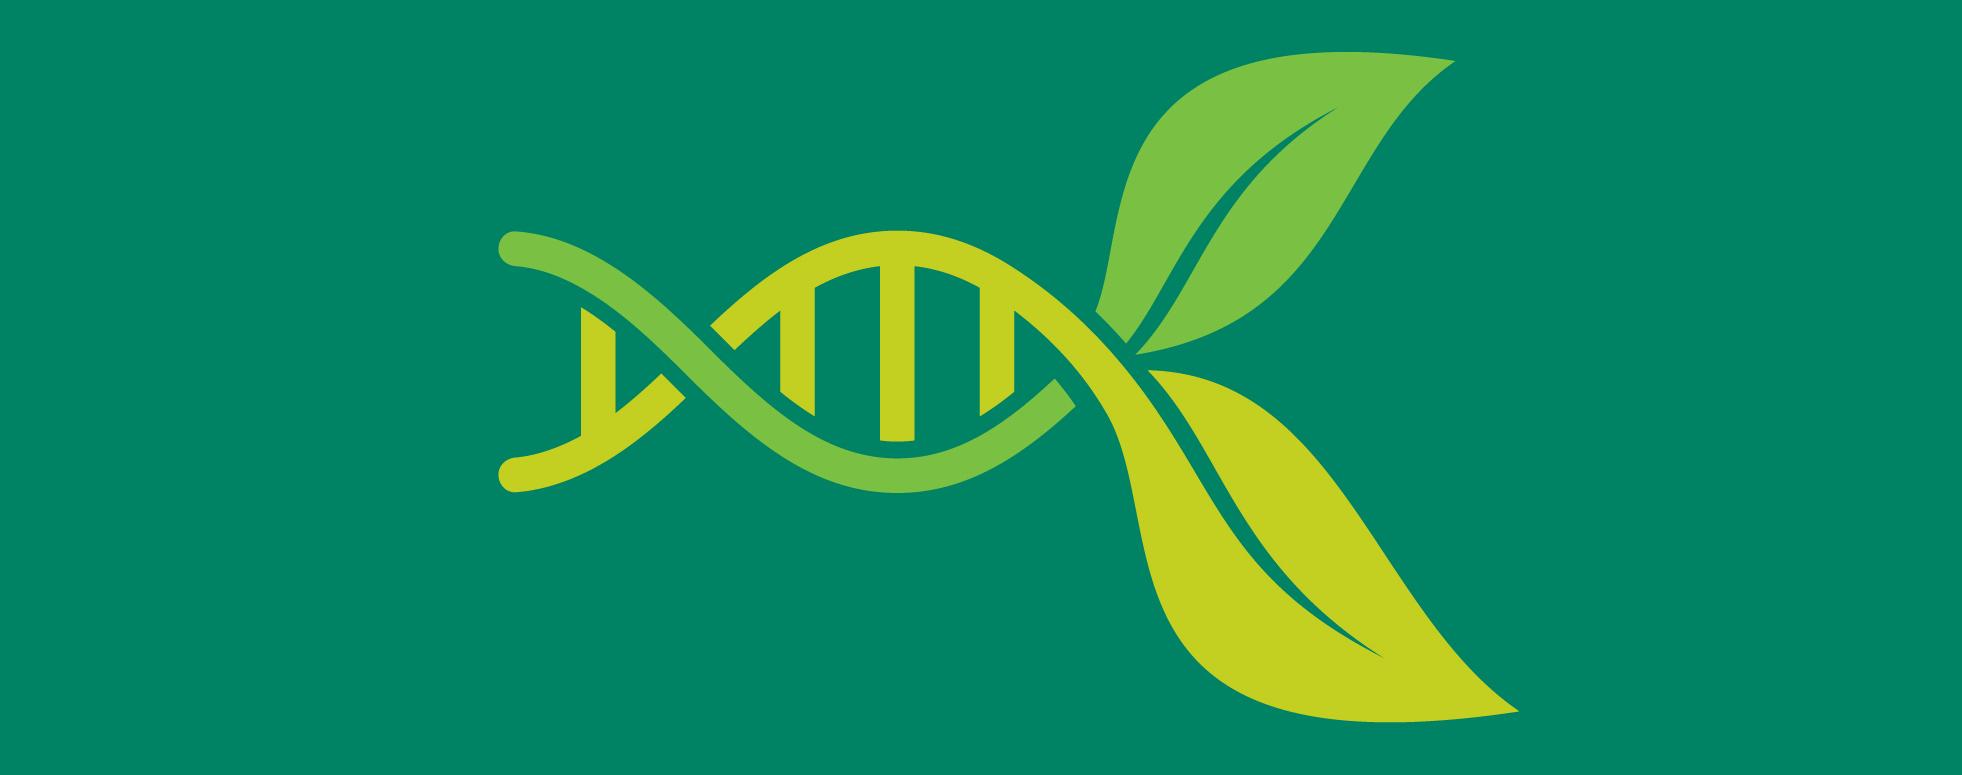 Gene expression image. The mechanics of plant development.